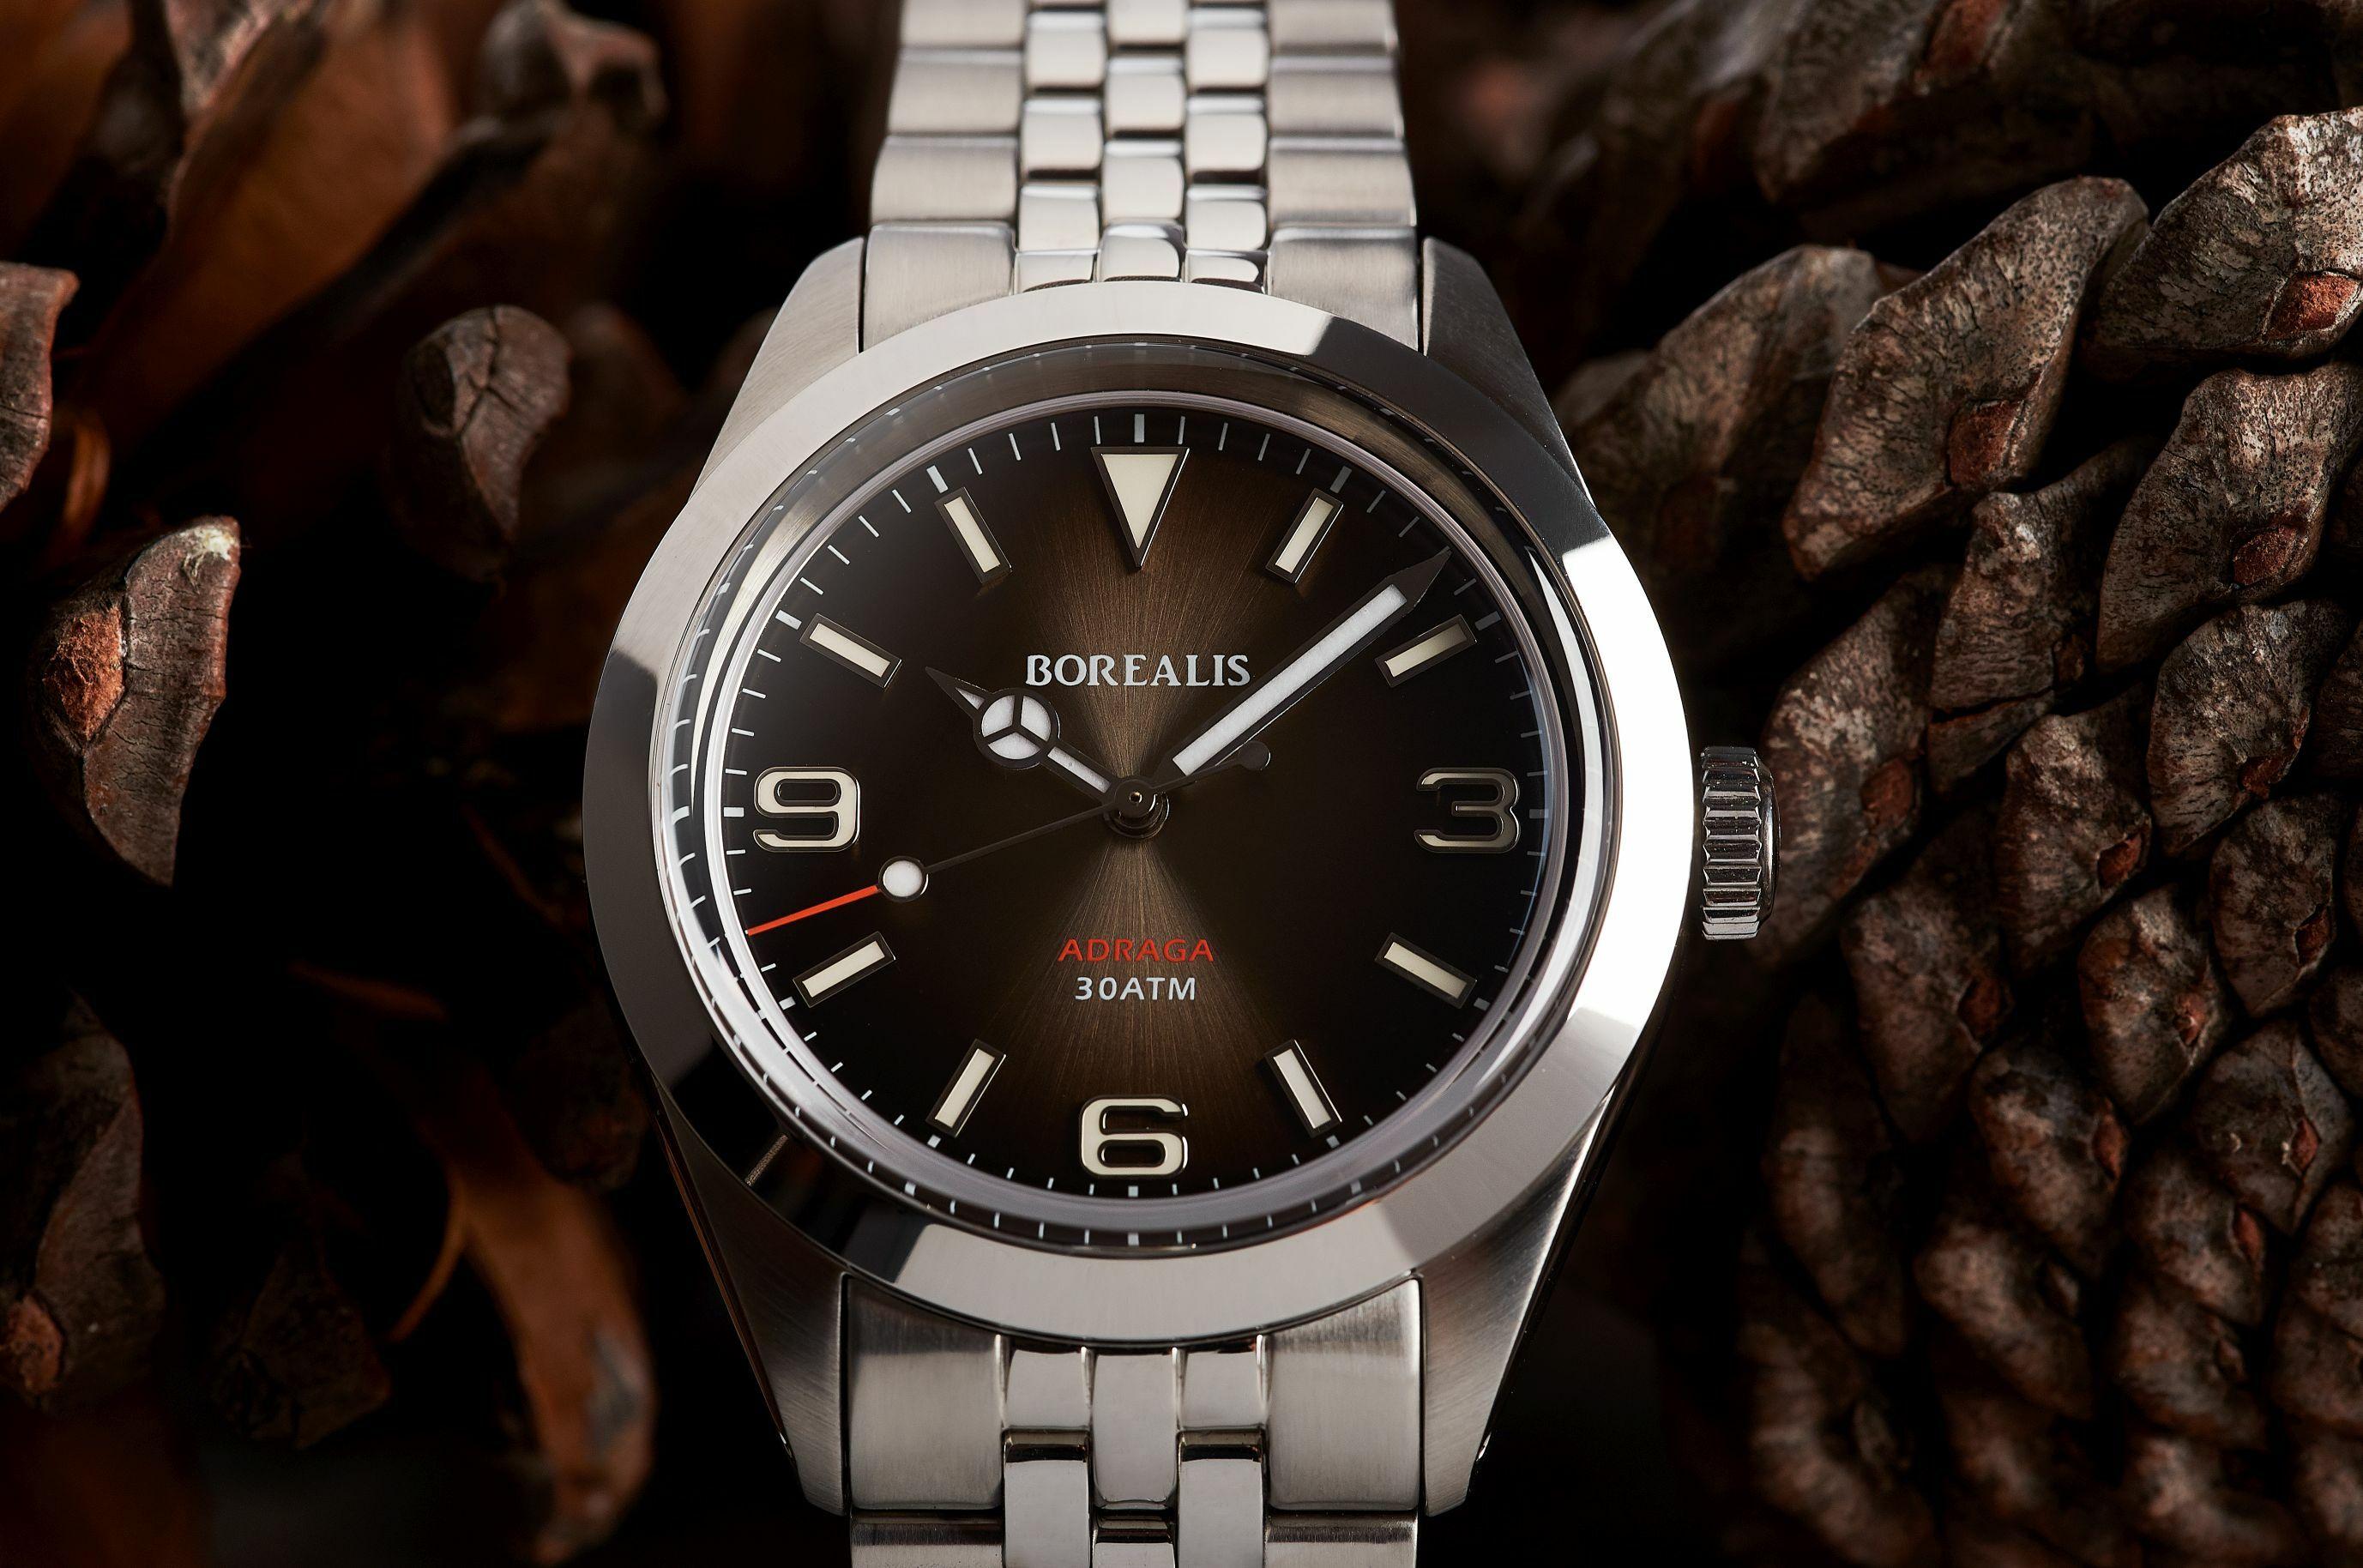 Borealis Adraga Stainless Steel Miyota 9015 fumed brown dial Mercedes Hands No Date BGW9 lume ADRAGA2BC